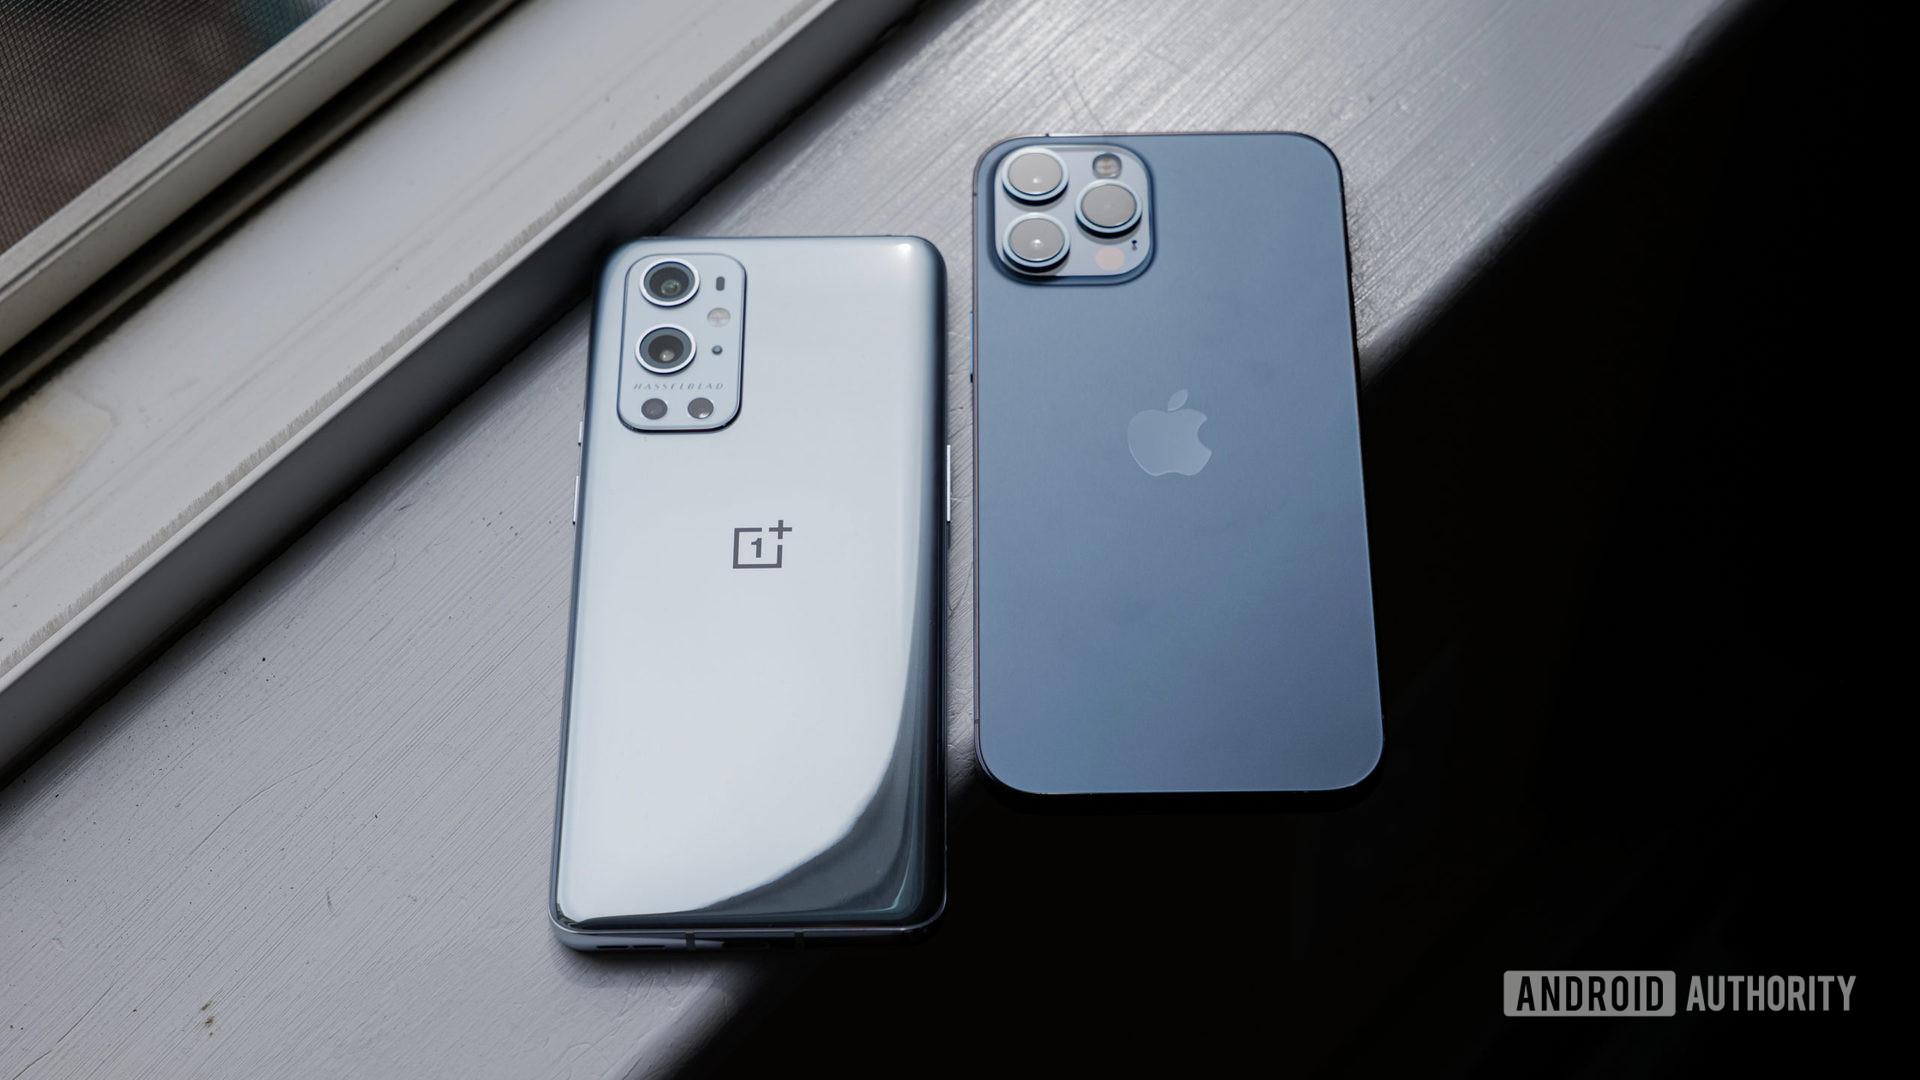 OnePlus 9 Pro vs iPhone 12 Pro Max on windowsill